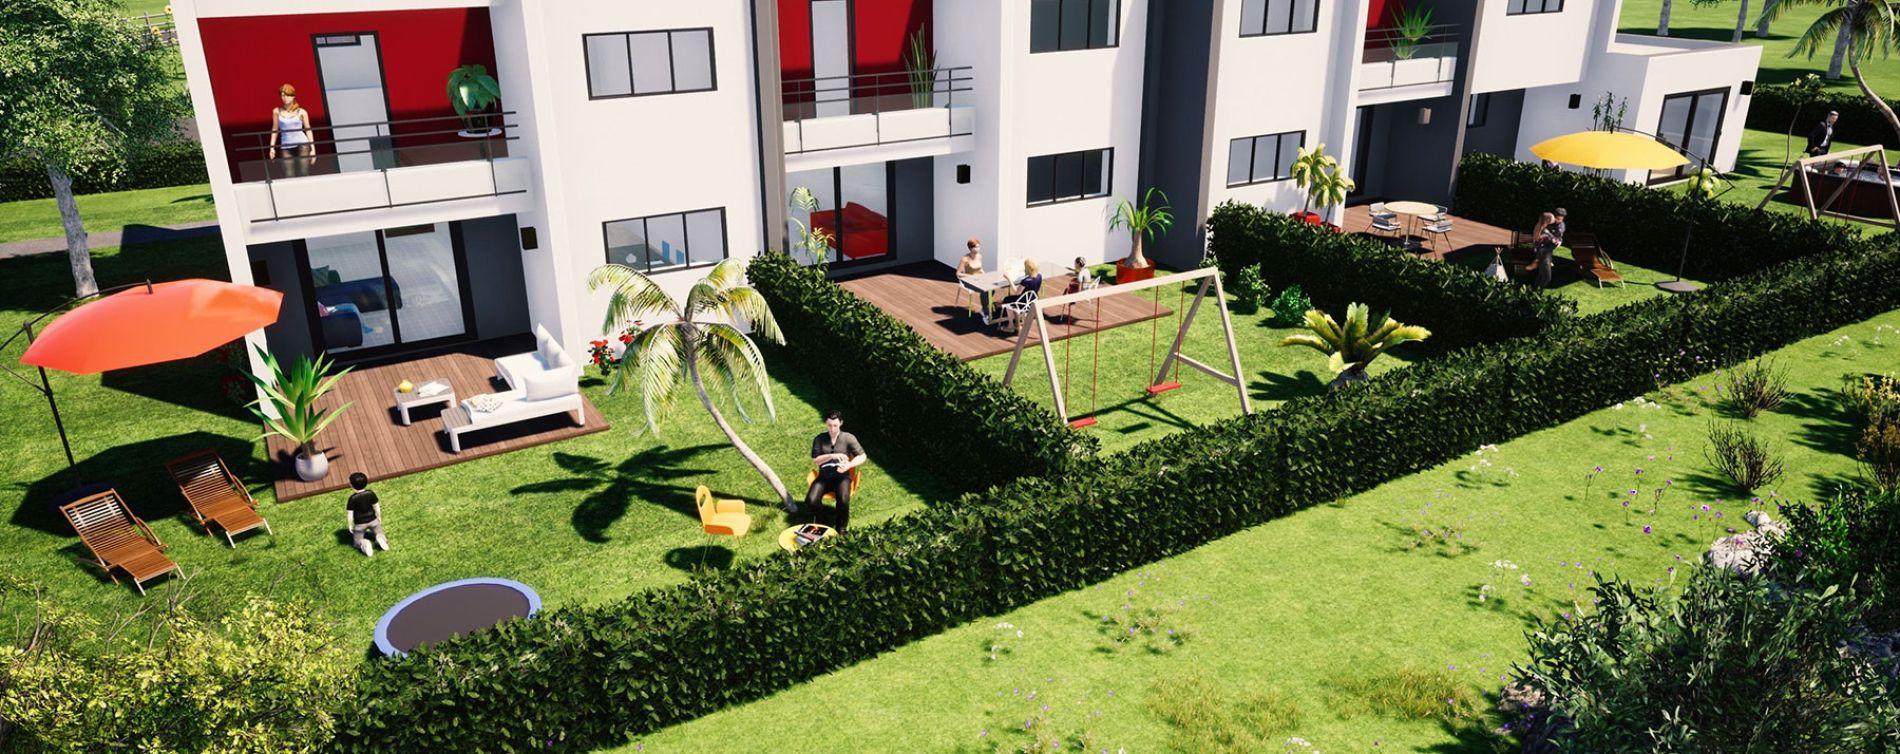 Le Mesnil-Esnard : programme immobilier neuve « Les Villas du Mesnil-Esnard »